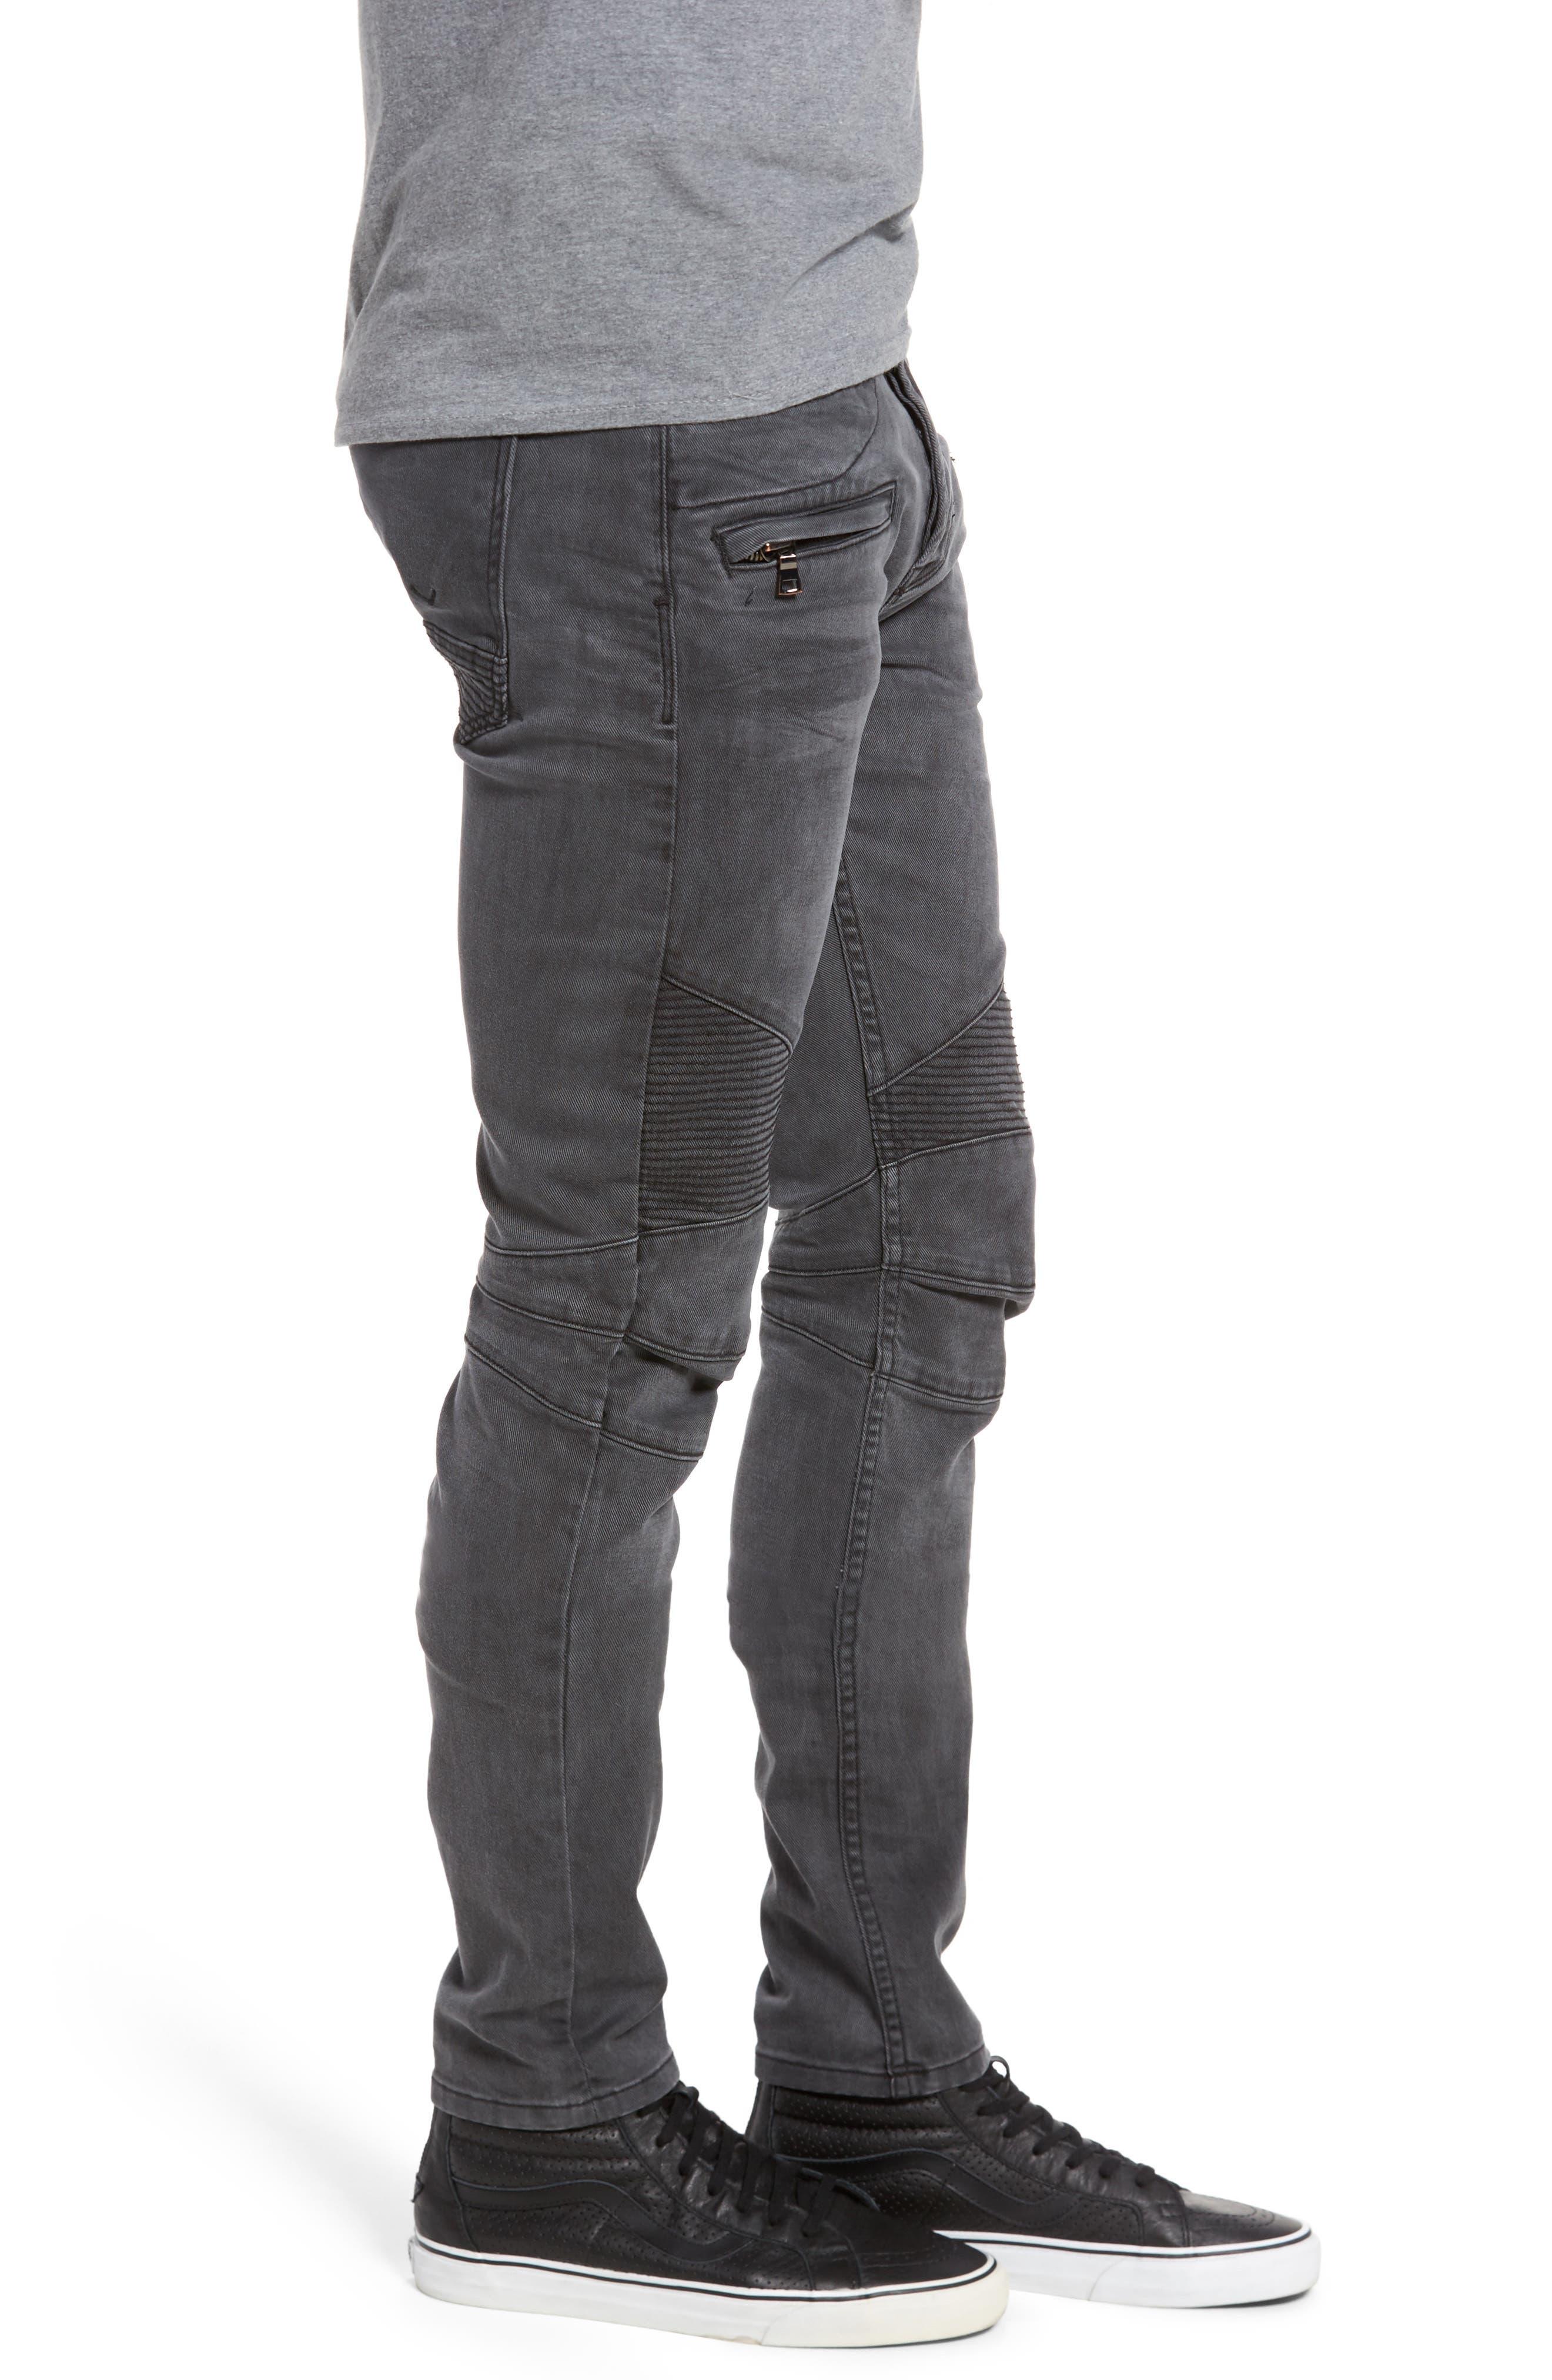 Blinder Biker Moto Skinny Fit Jeans,                             Alternate thumbnail 3, color,                             MIXTAPE